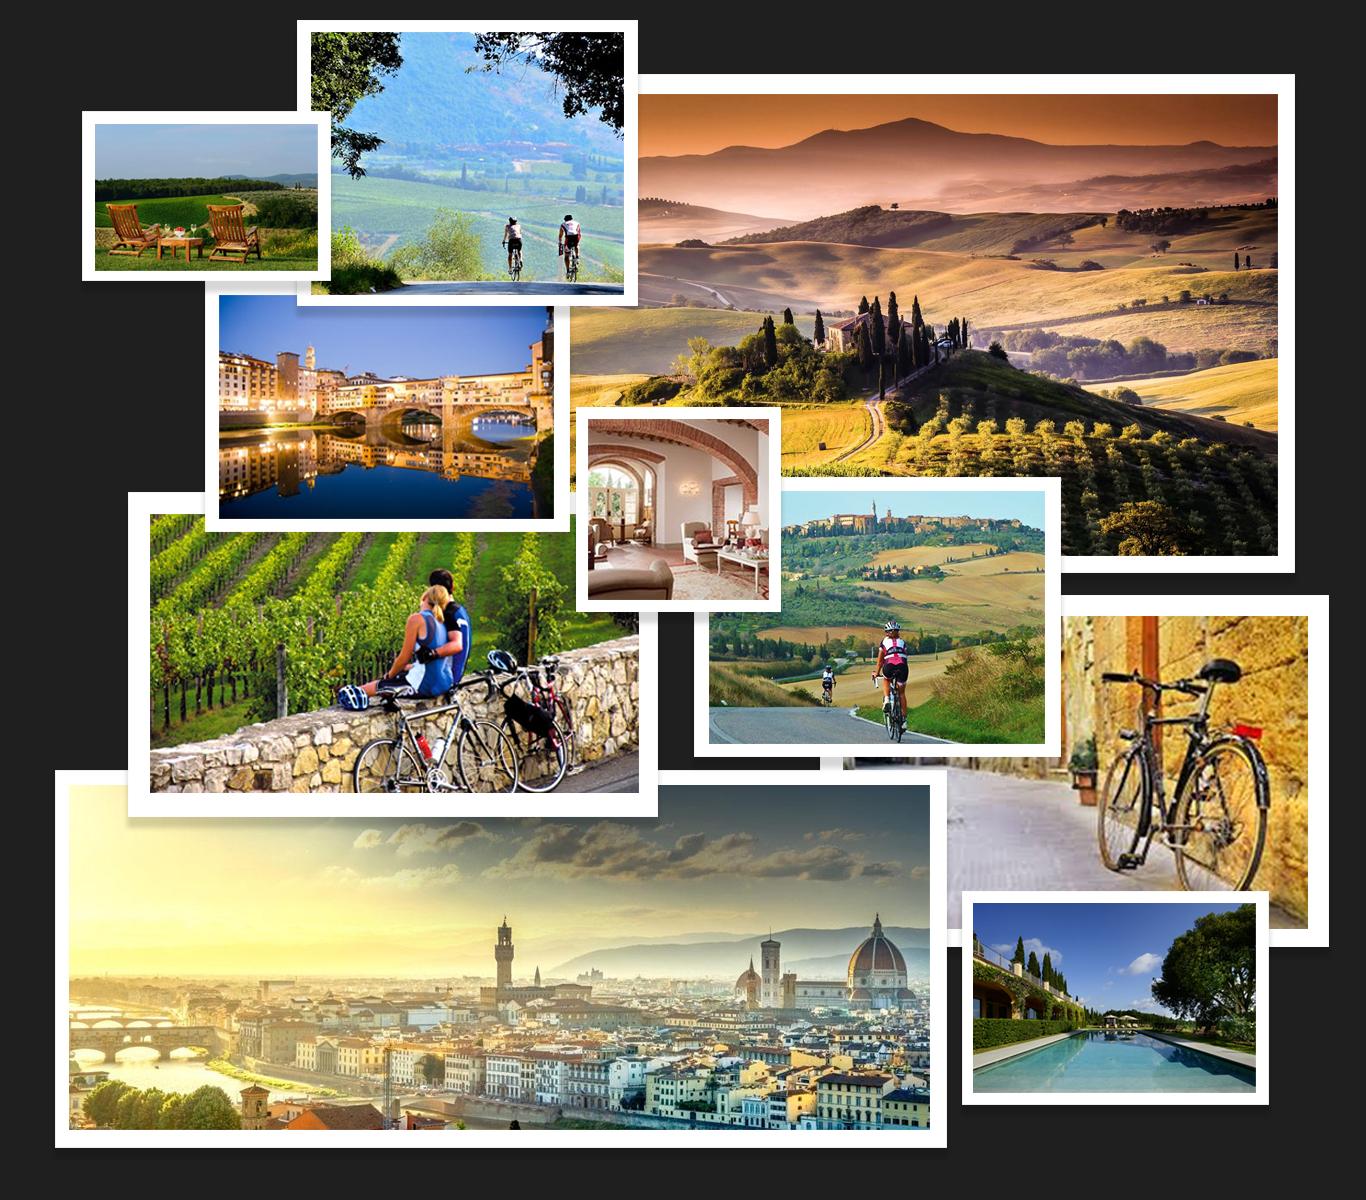 creations-luxury-travel-tuscany-cycling-biking.jpg